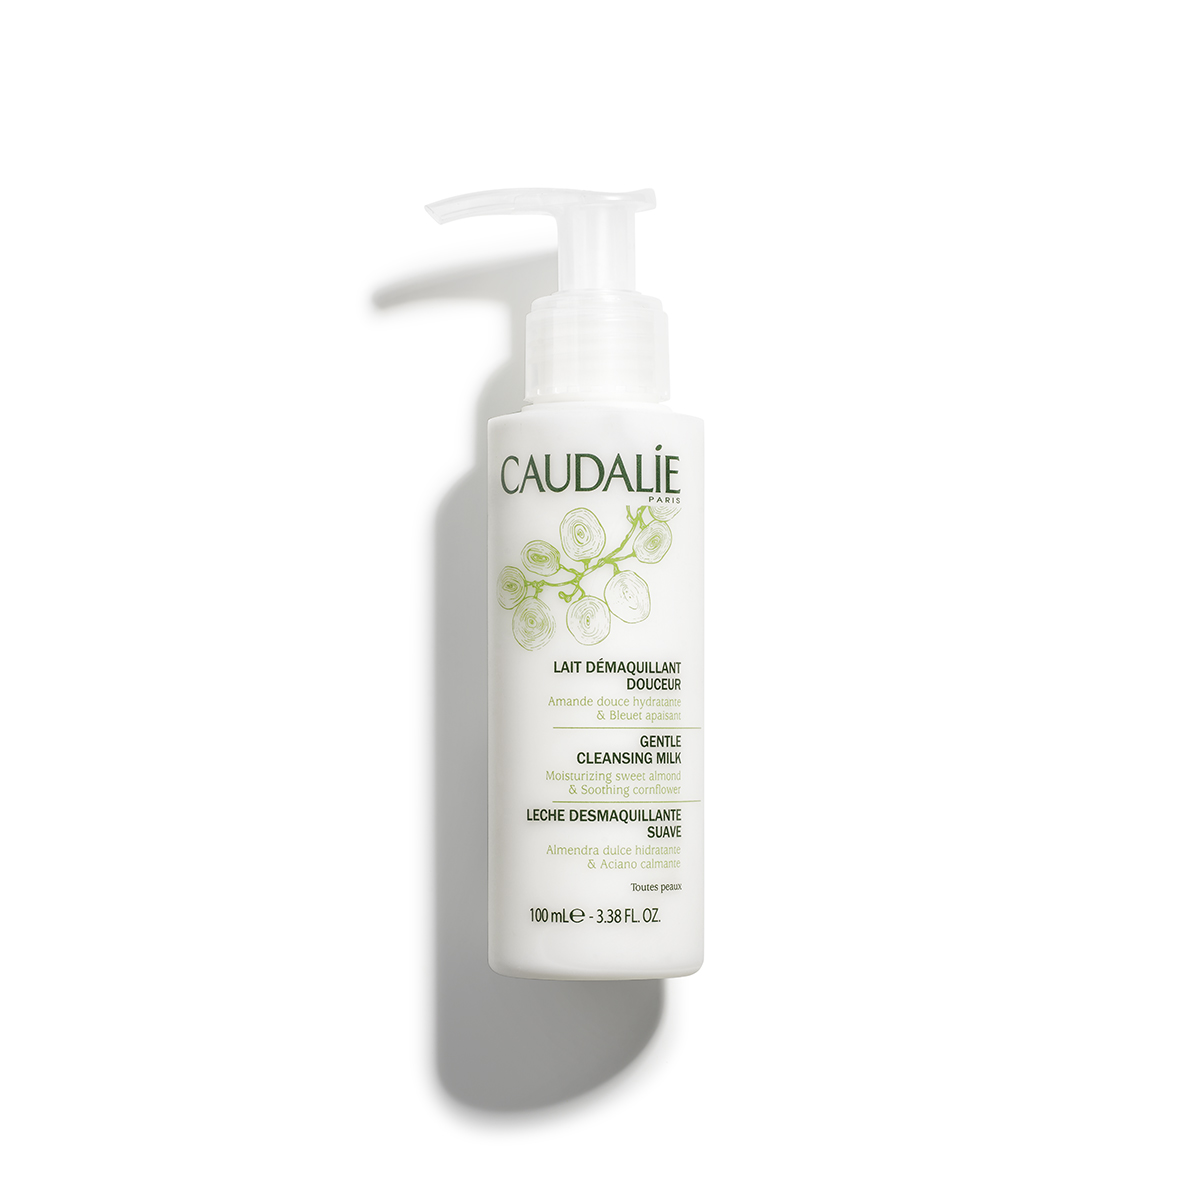 Gentle CleansingMilk - Travel Size